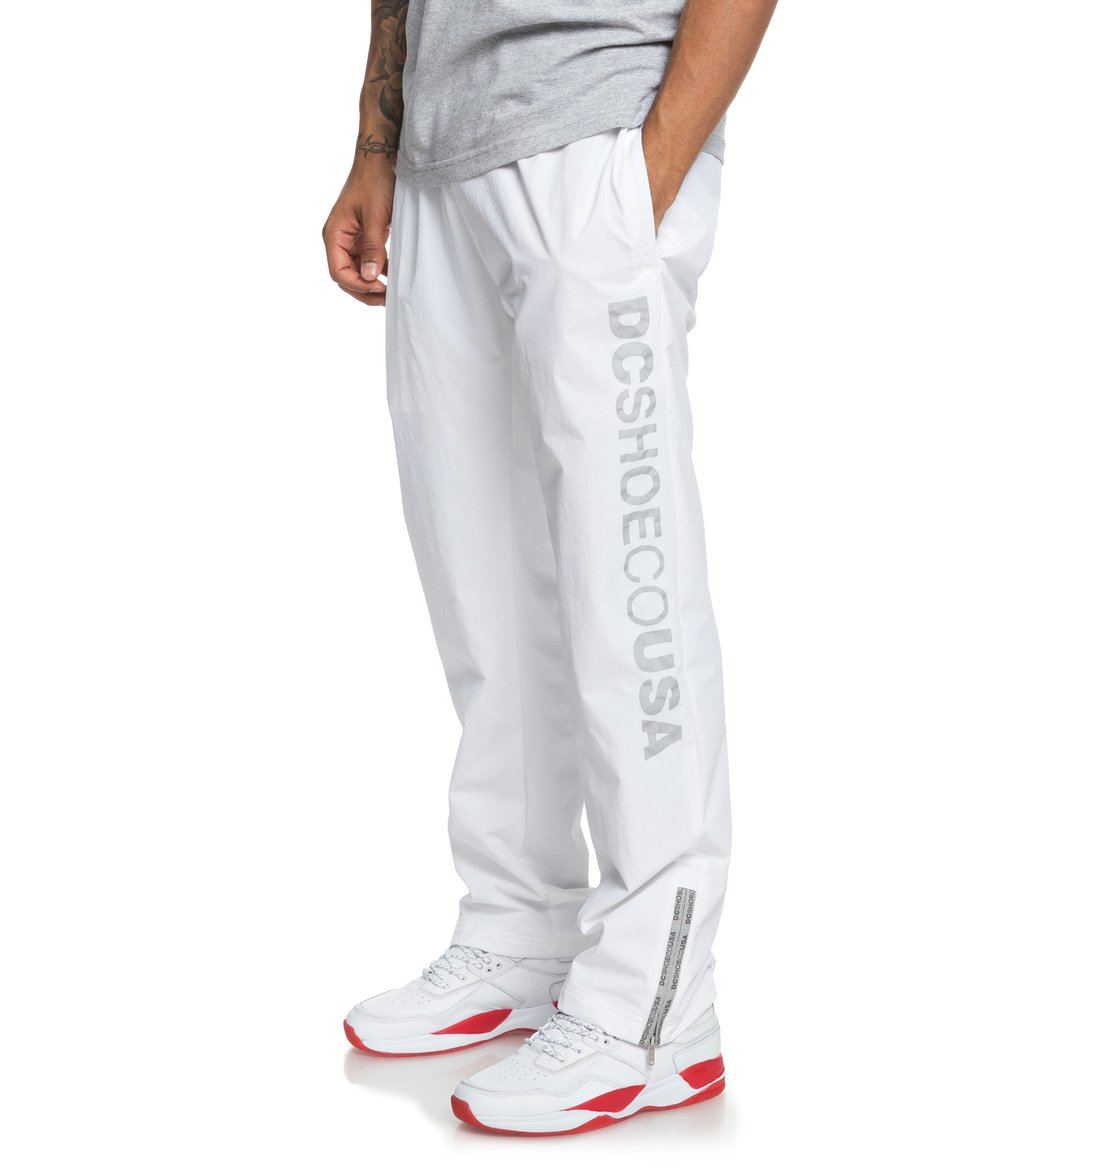 66e8d8e8 2 Skate - Water-Resistant Tracksuit Bottoms for Men White ADYNP03040 DC  Shoes